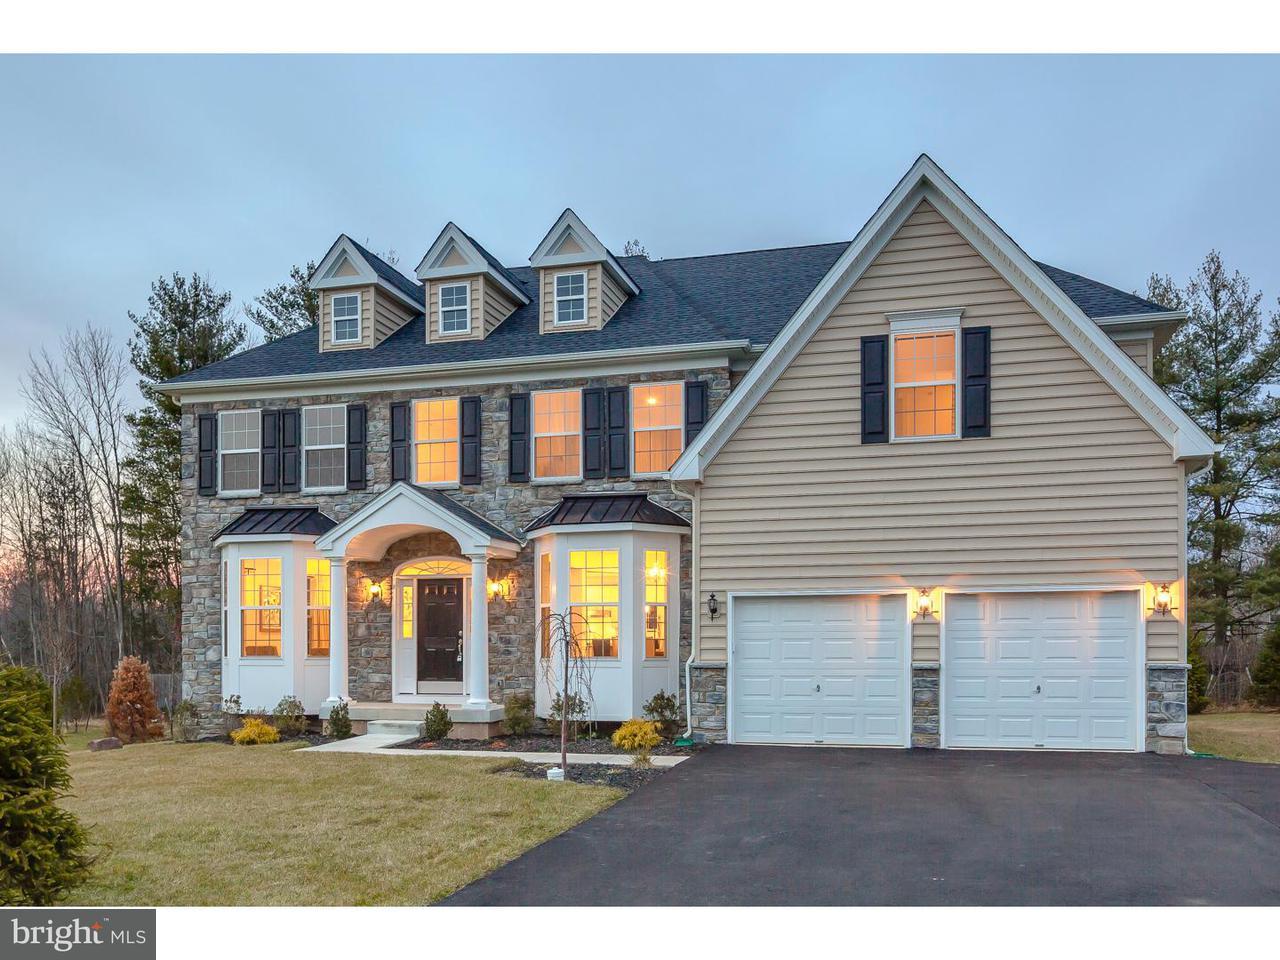 Single Family Home for Sale at 2535 CINDY Lane Warrington, Pennsylvania 18976 United States